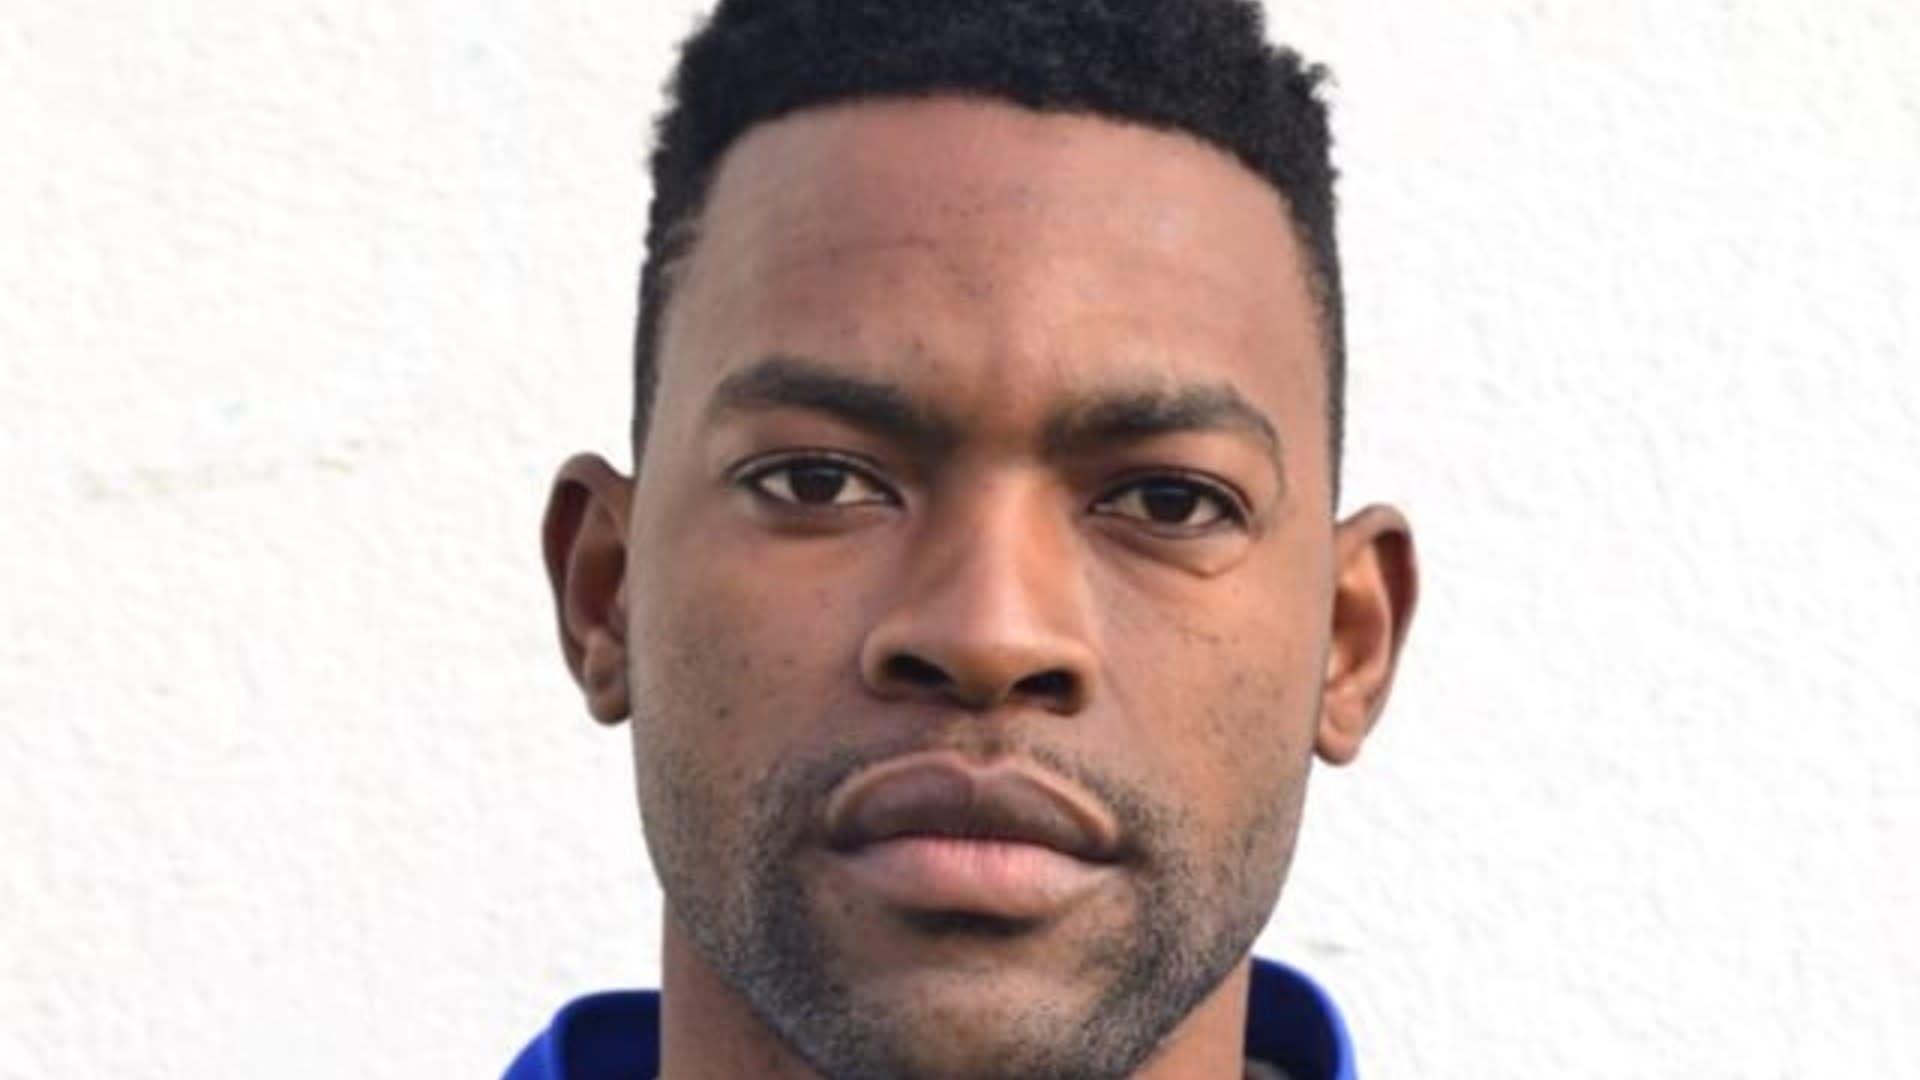 ABC Motsepe's Police FC confirm the passing of midfielder Mthembu